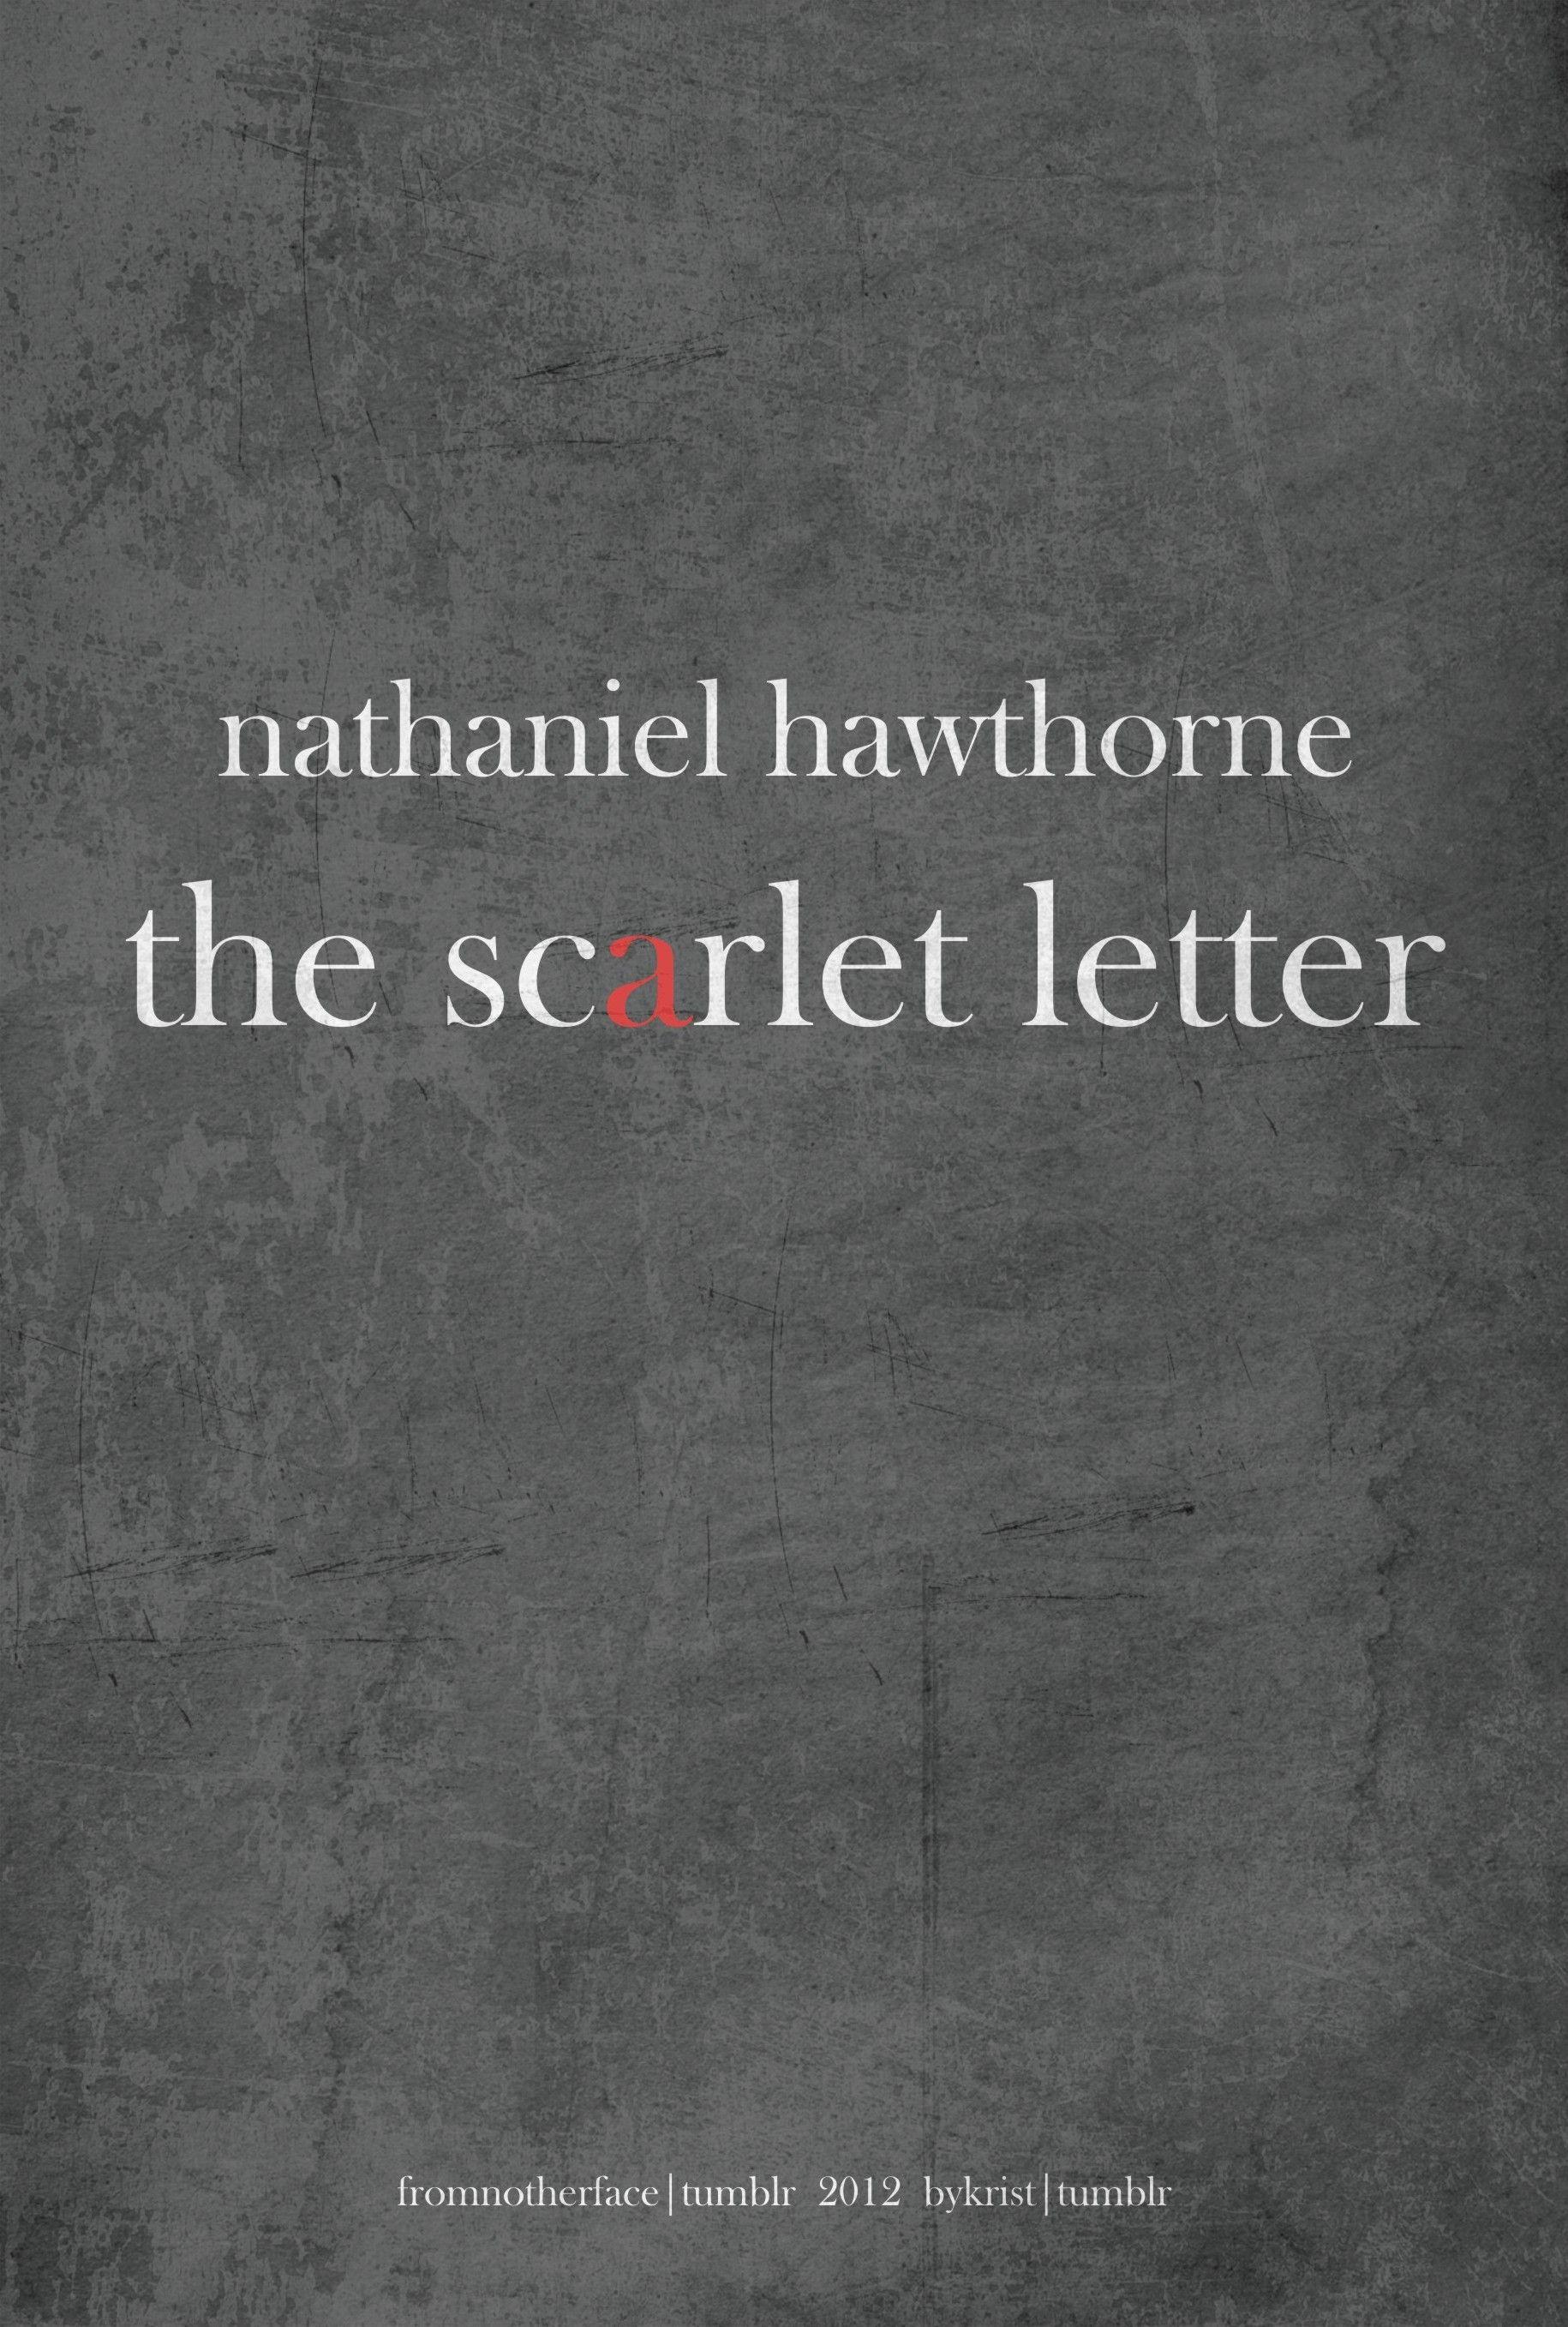 Nathaniel Hawthornes The Scarlet Letter